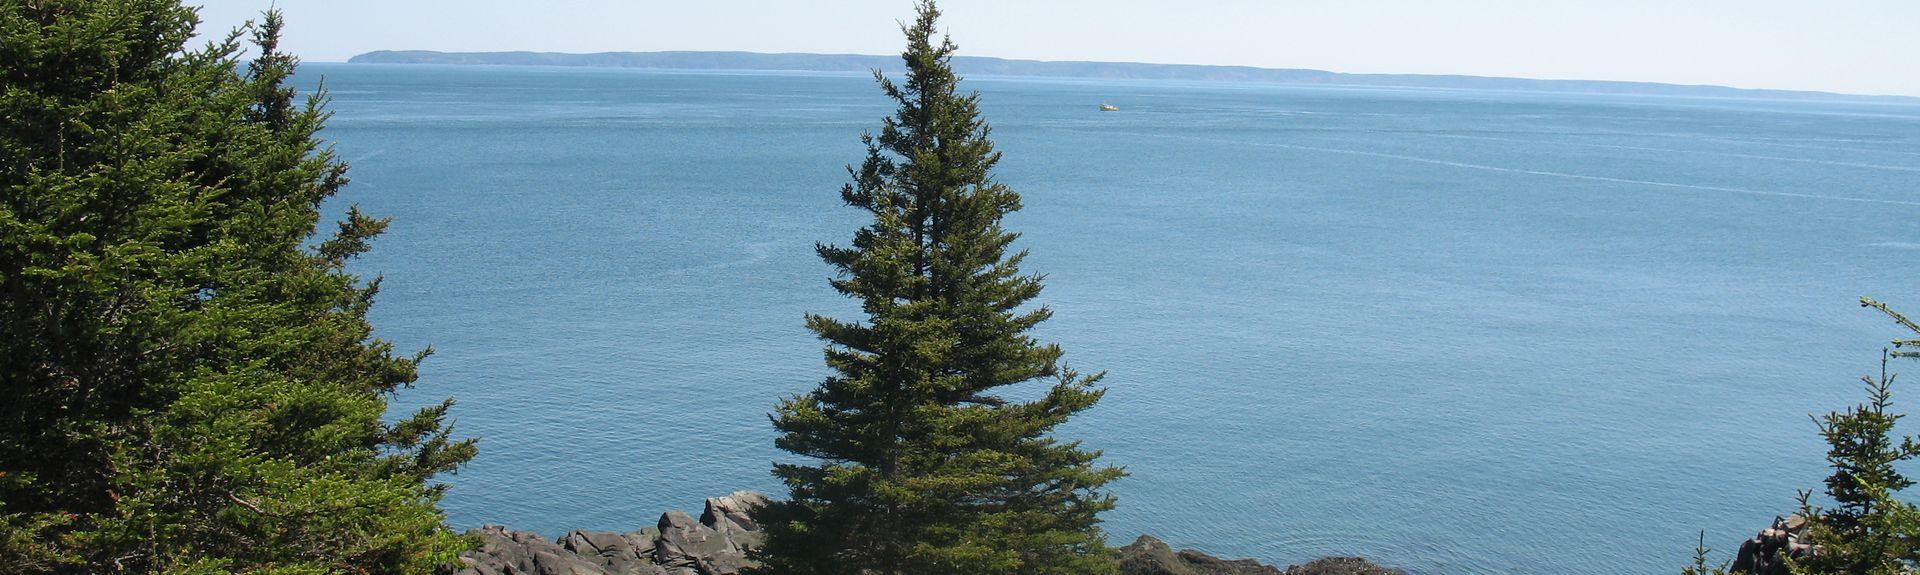 Anchorage Provincial Park, Grand Manan, New Brunswick, Canada